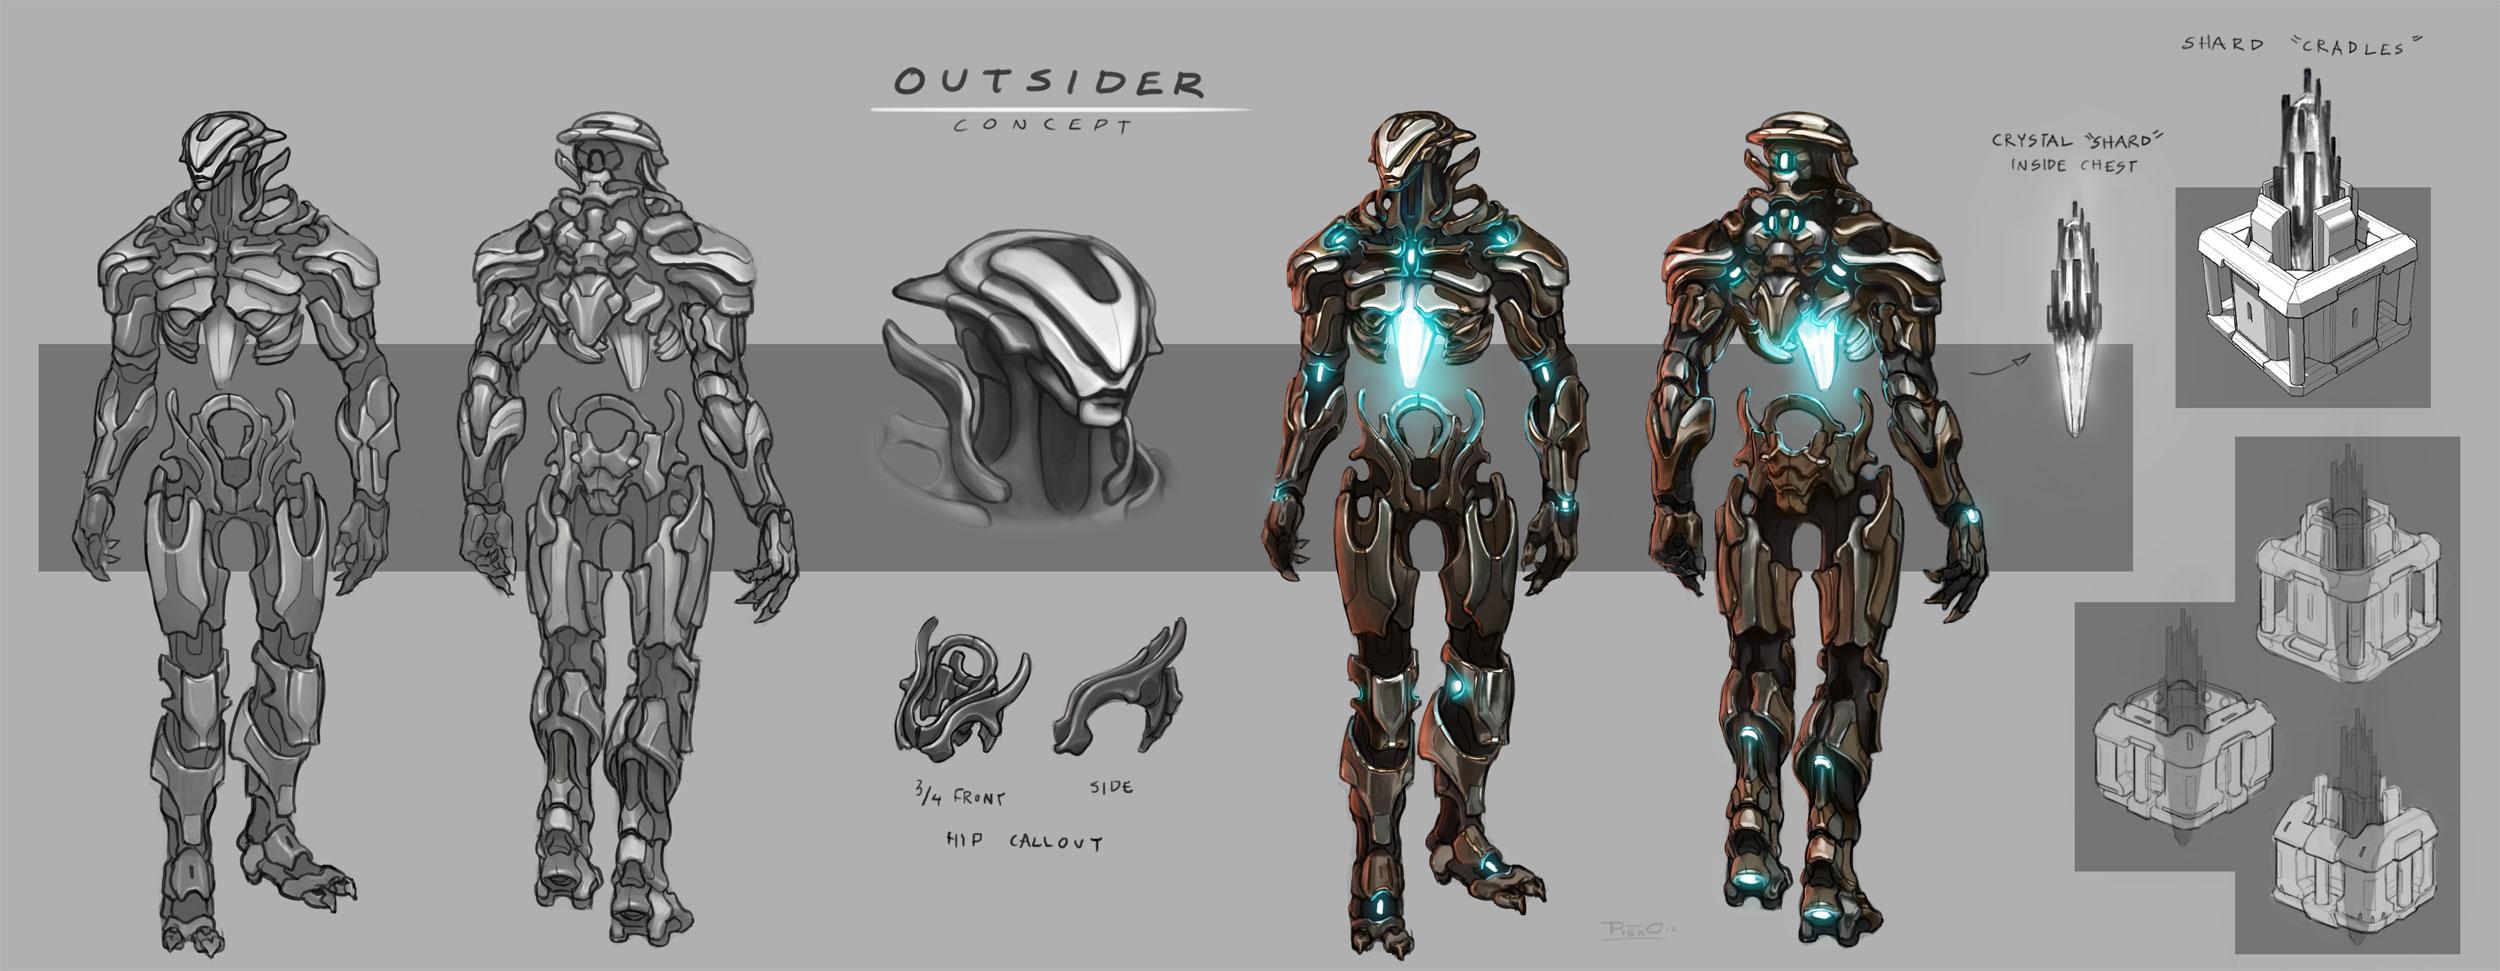 Image - Concept - Outsider.jpg - XCOM Wiki